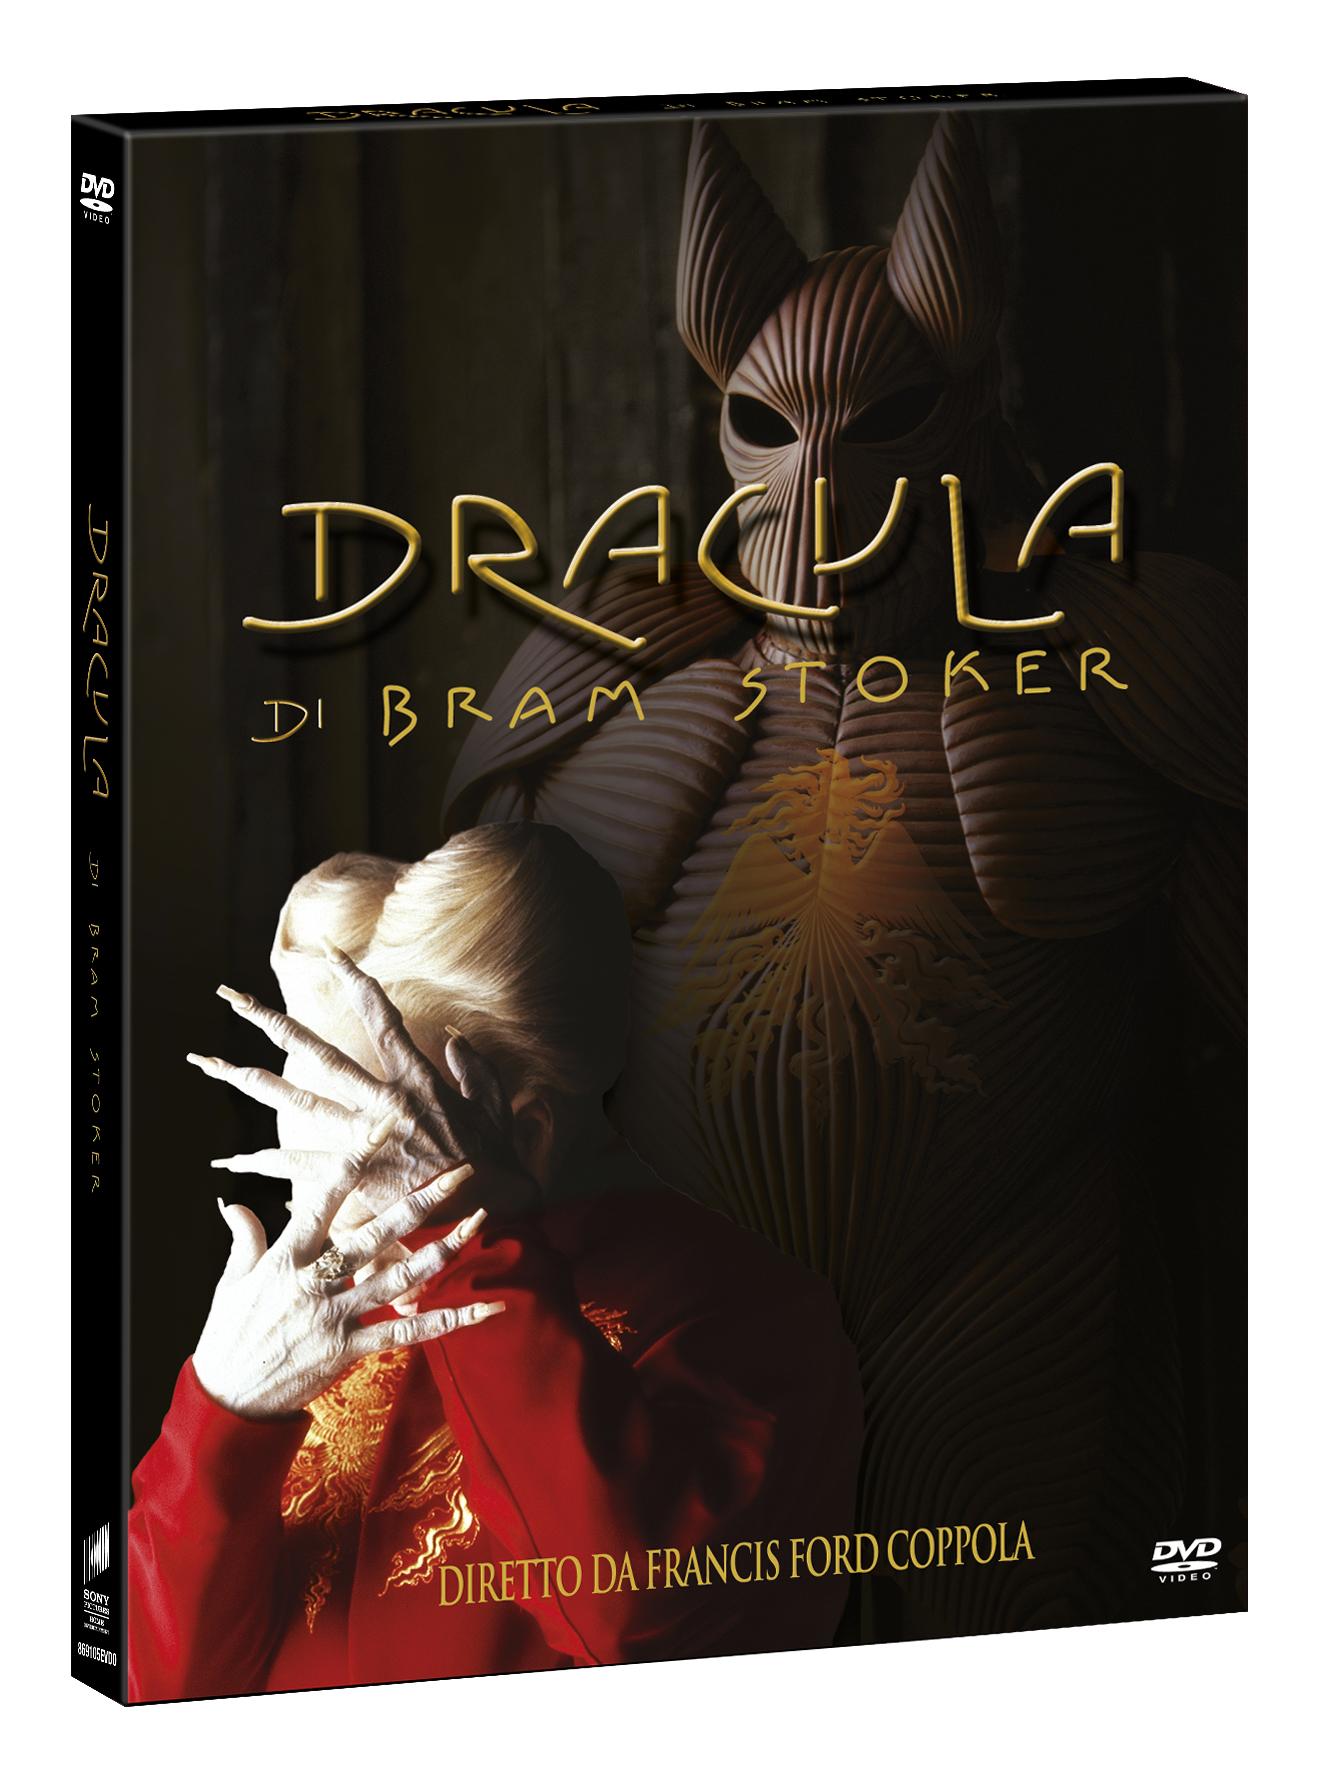 DRACULA DI BRAM STOKER (DVD)